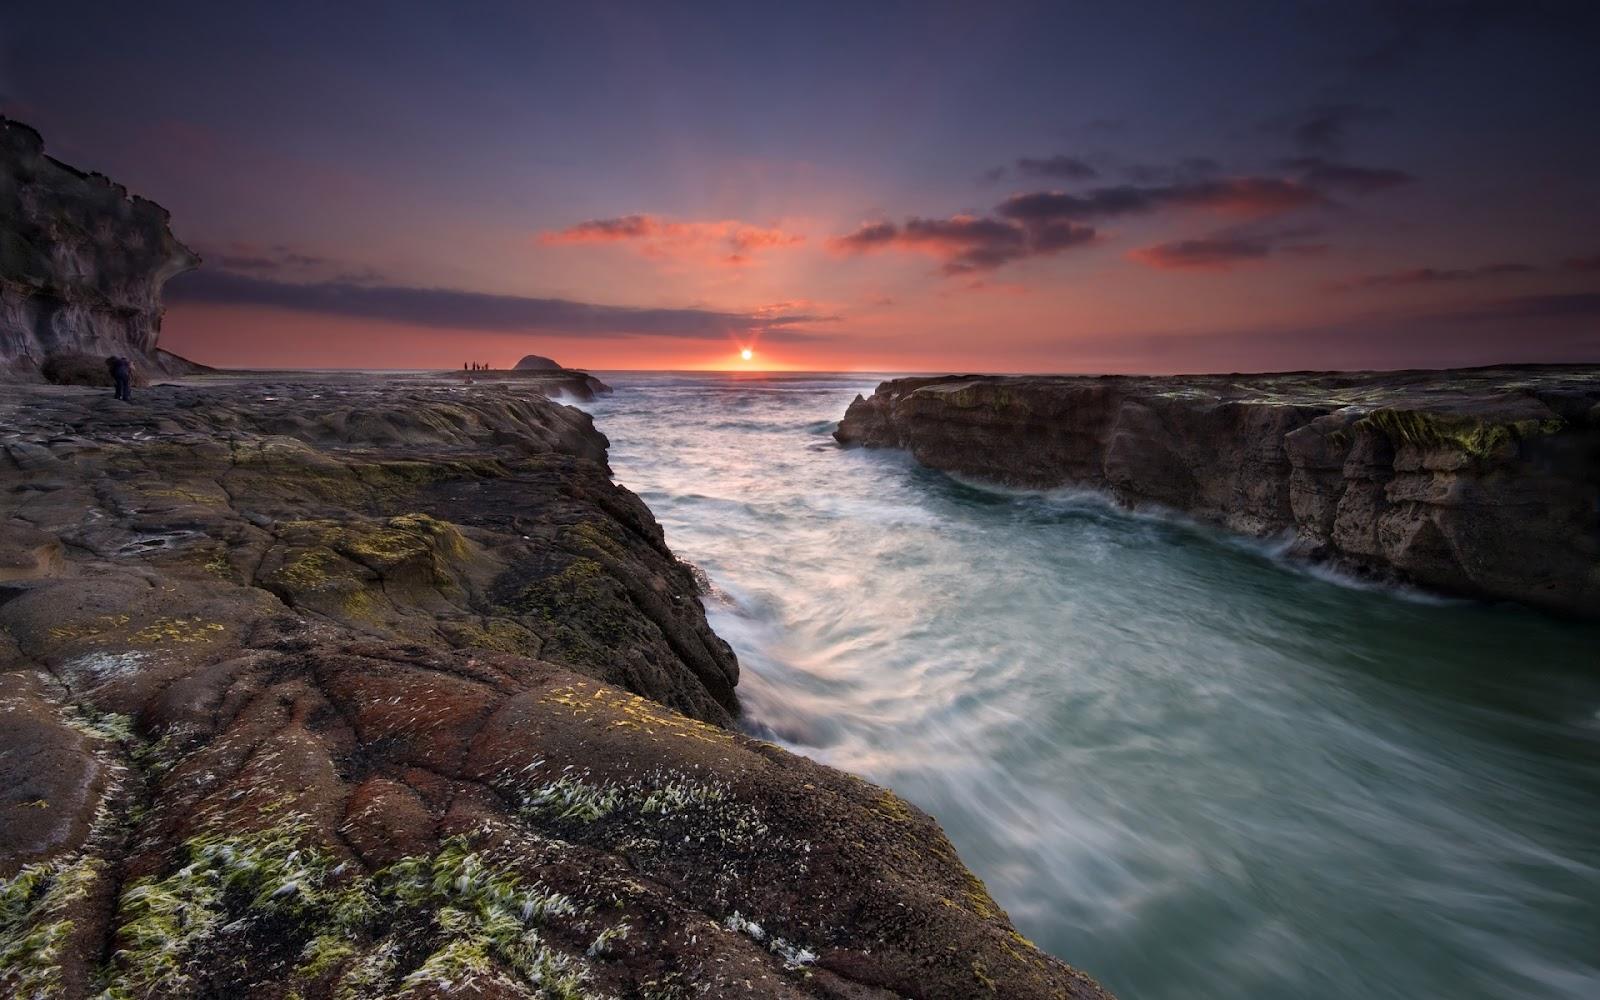 Sunset Muriwai Beach Full HD Nature Background Wallpaper for Laptop 1600x1000